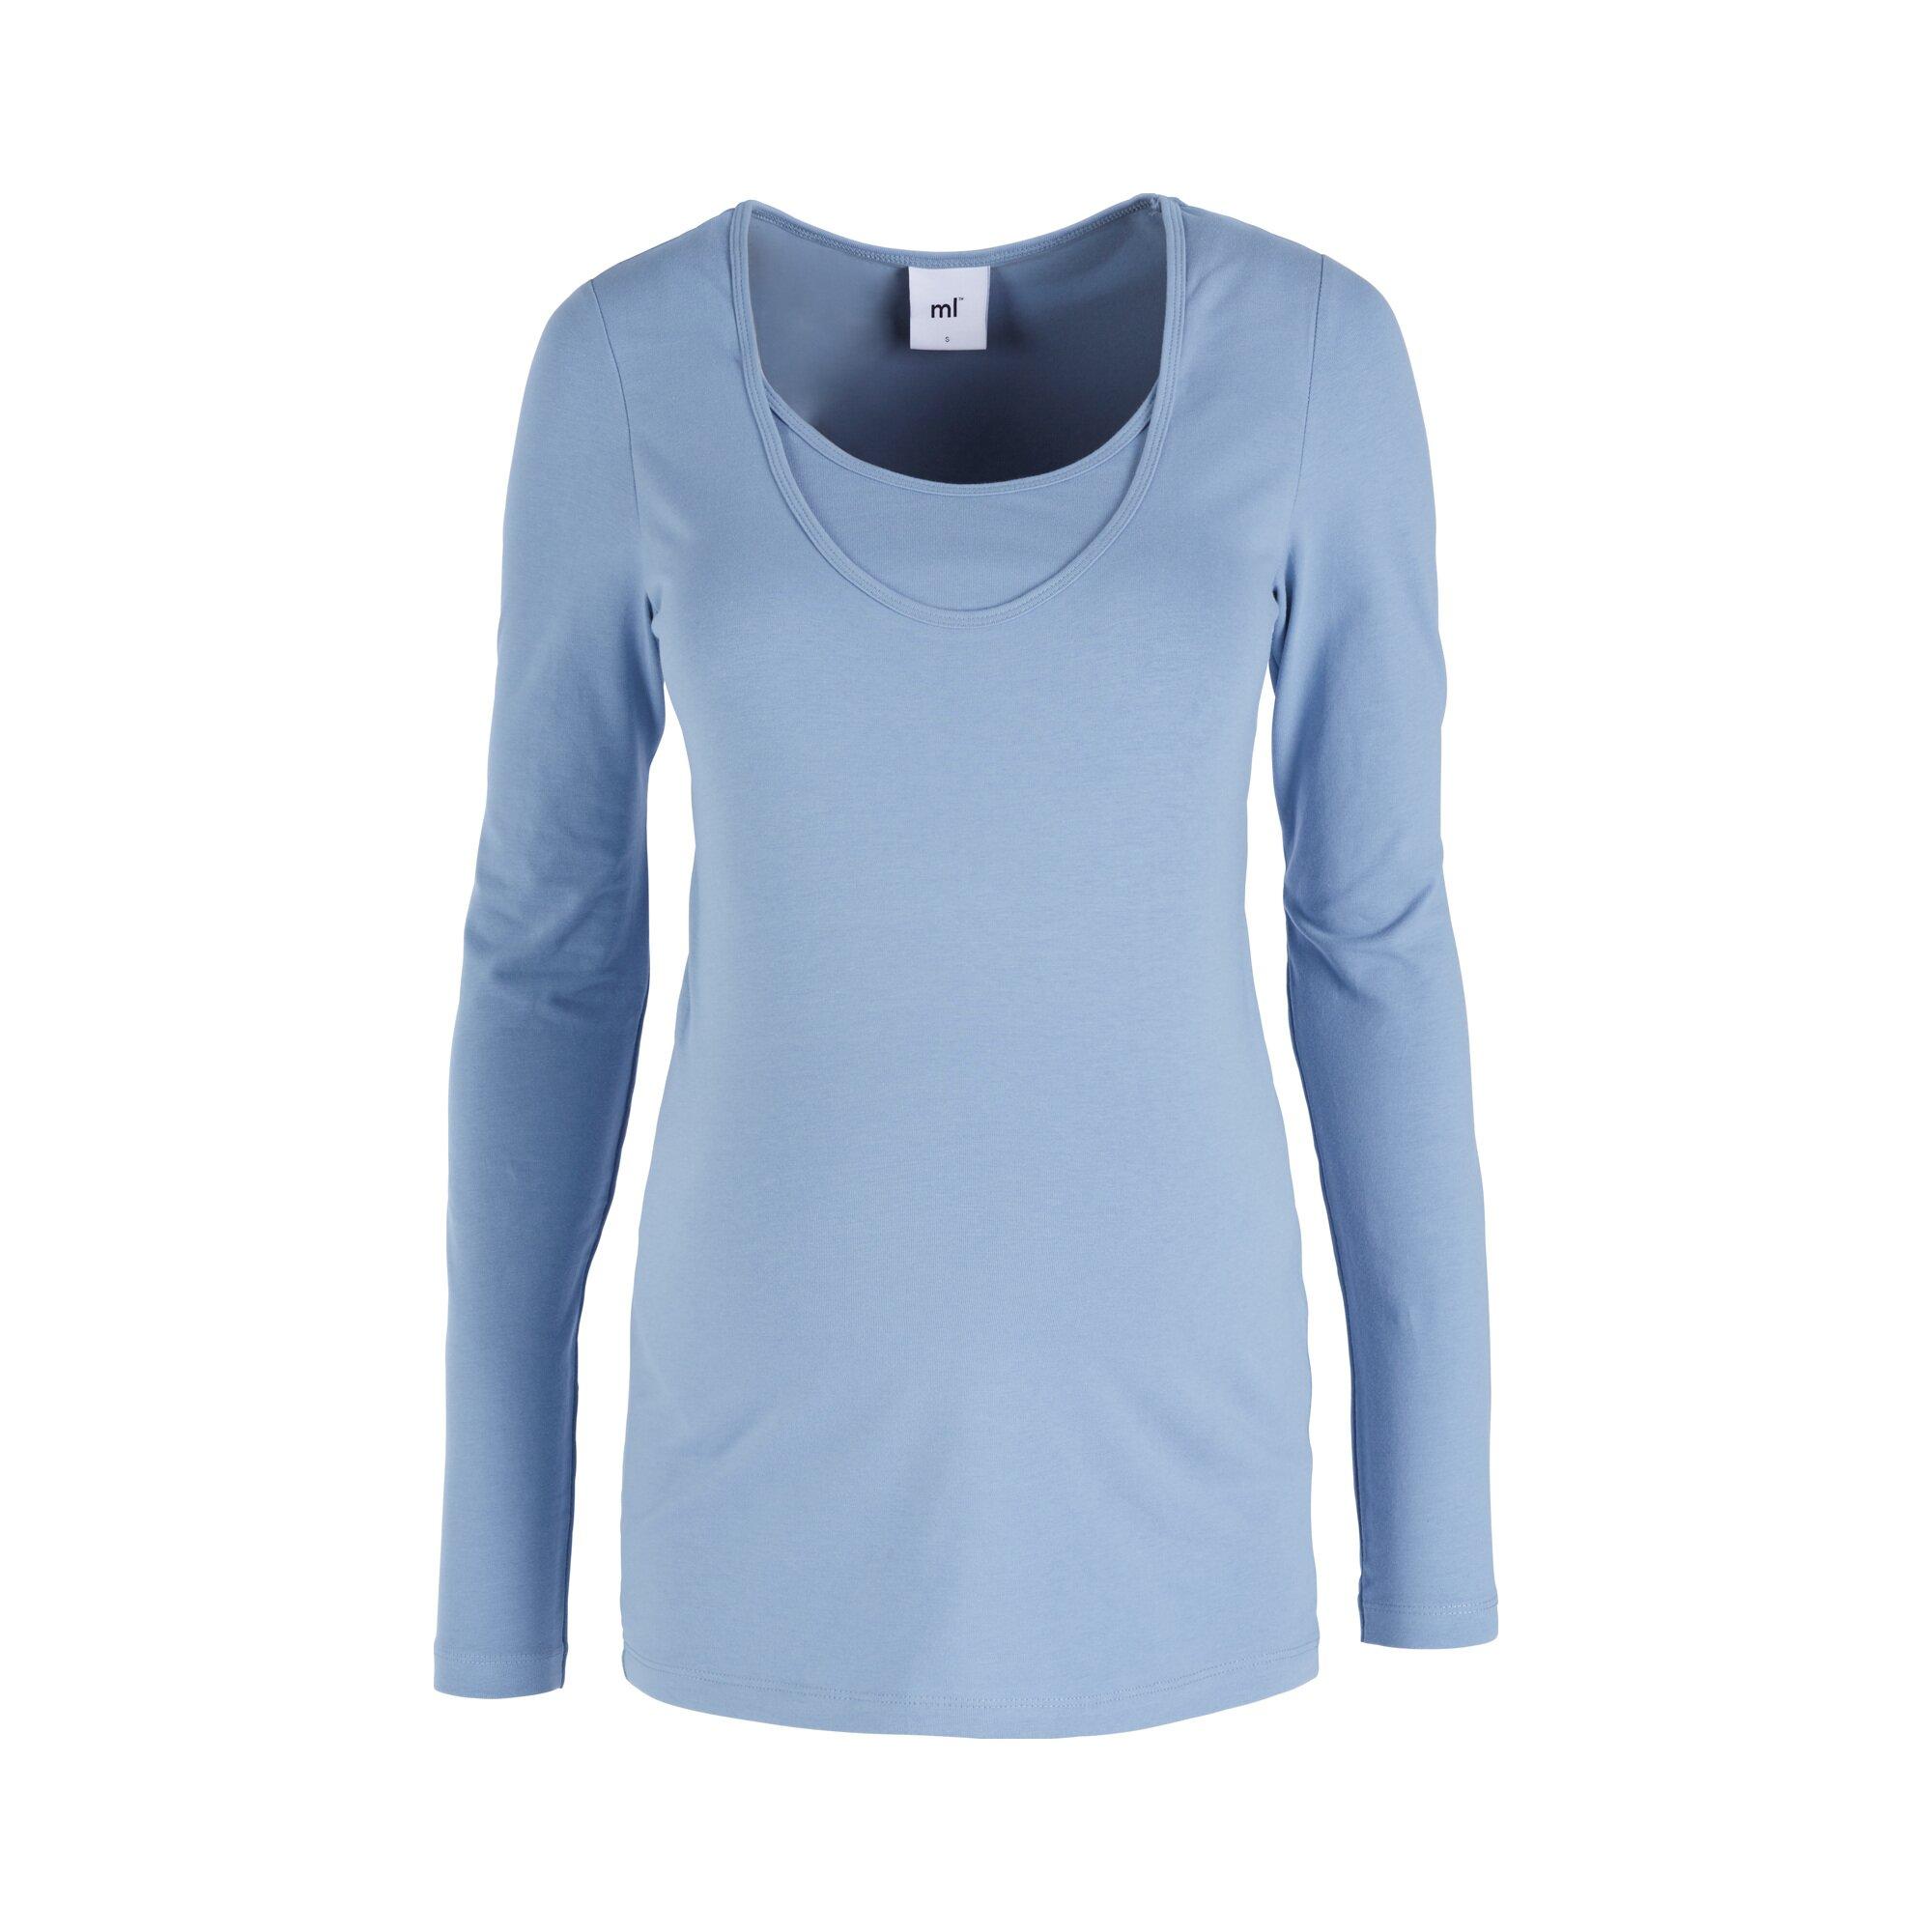 mama-licious-2er-pack-umstandsshirt-und-stillshirts-lea-organic-nell